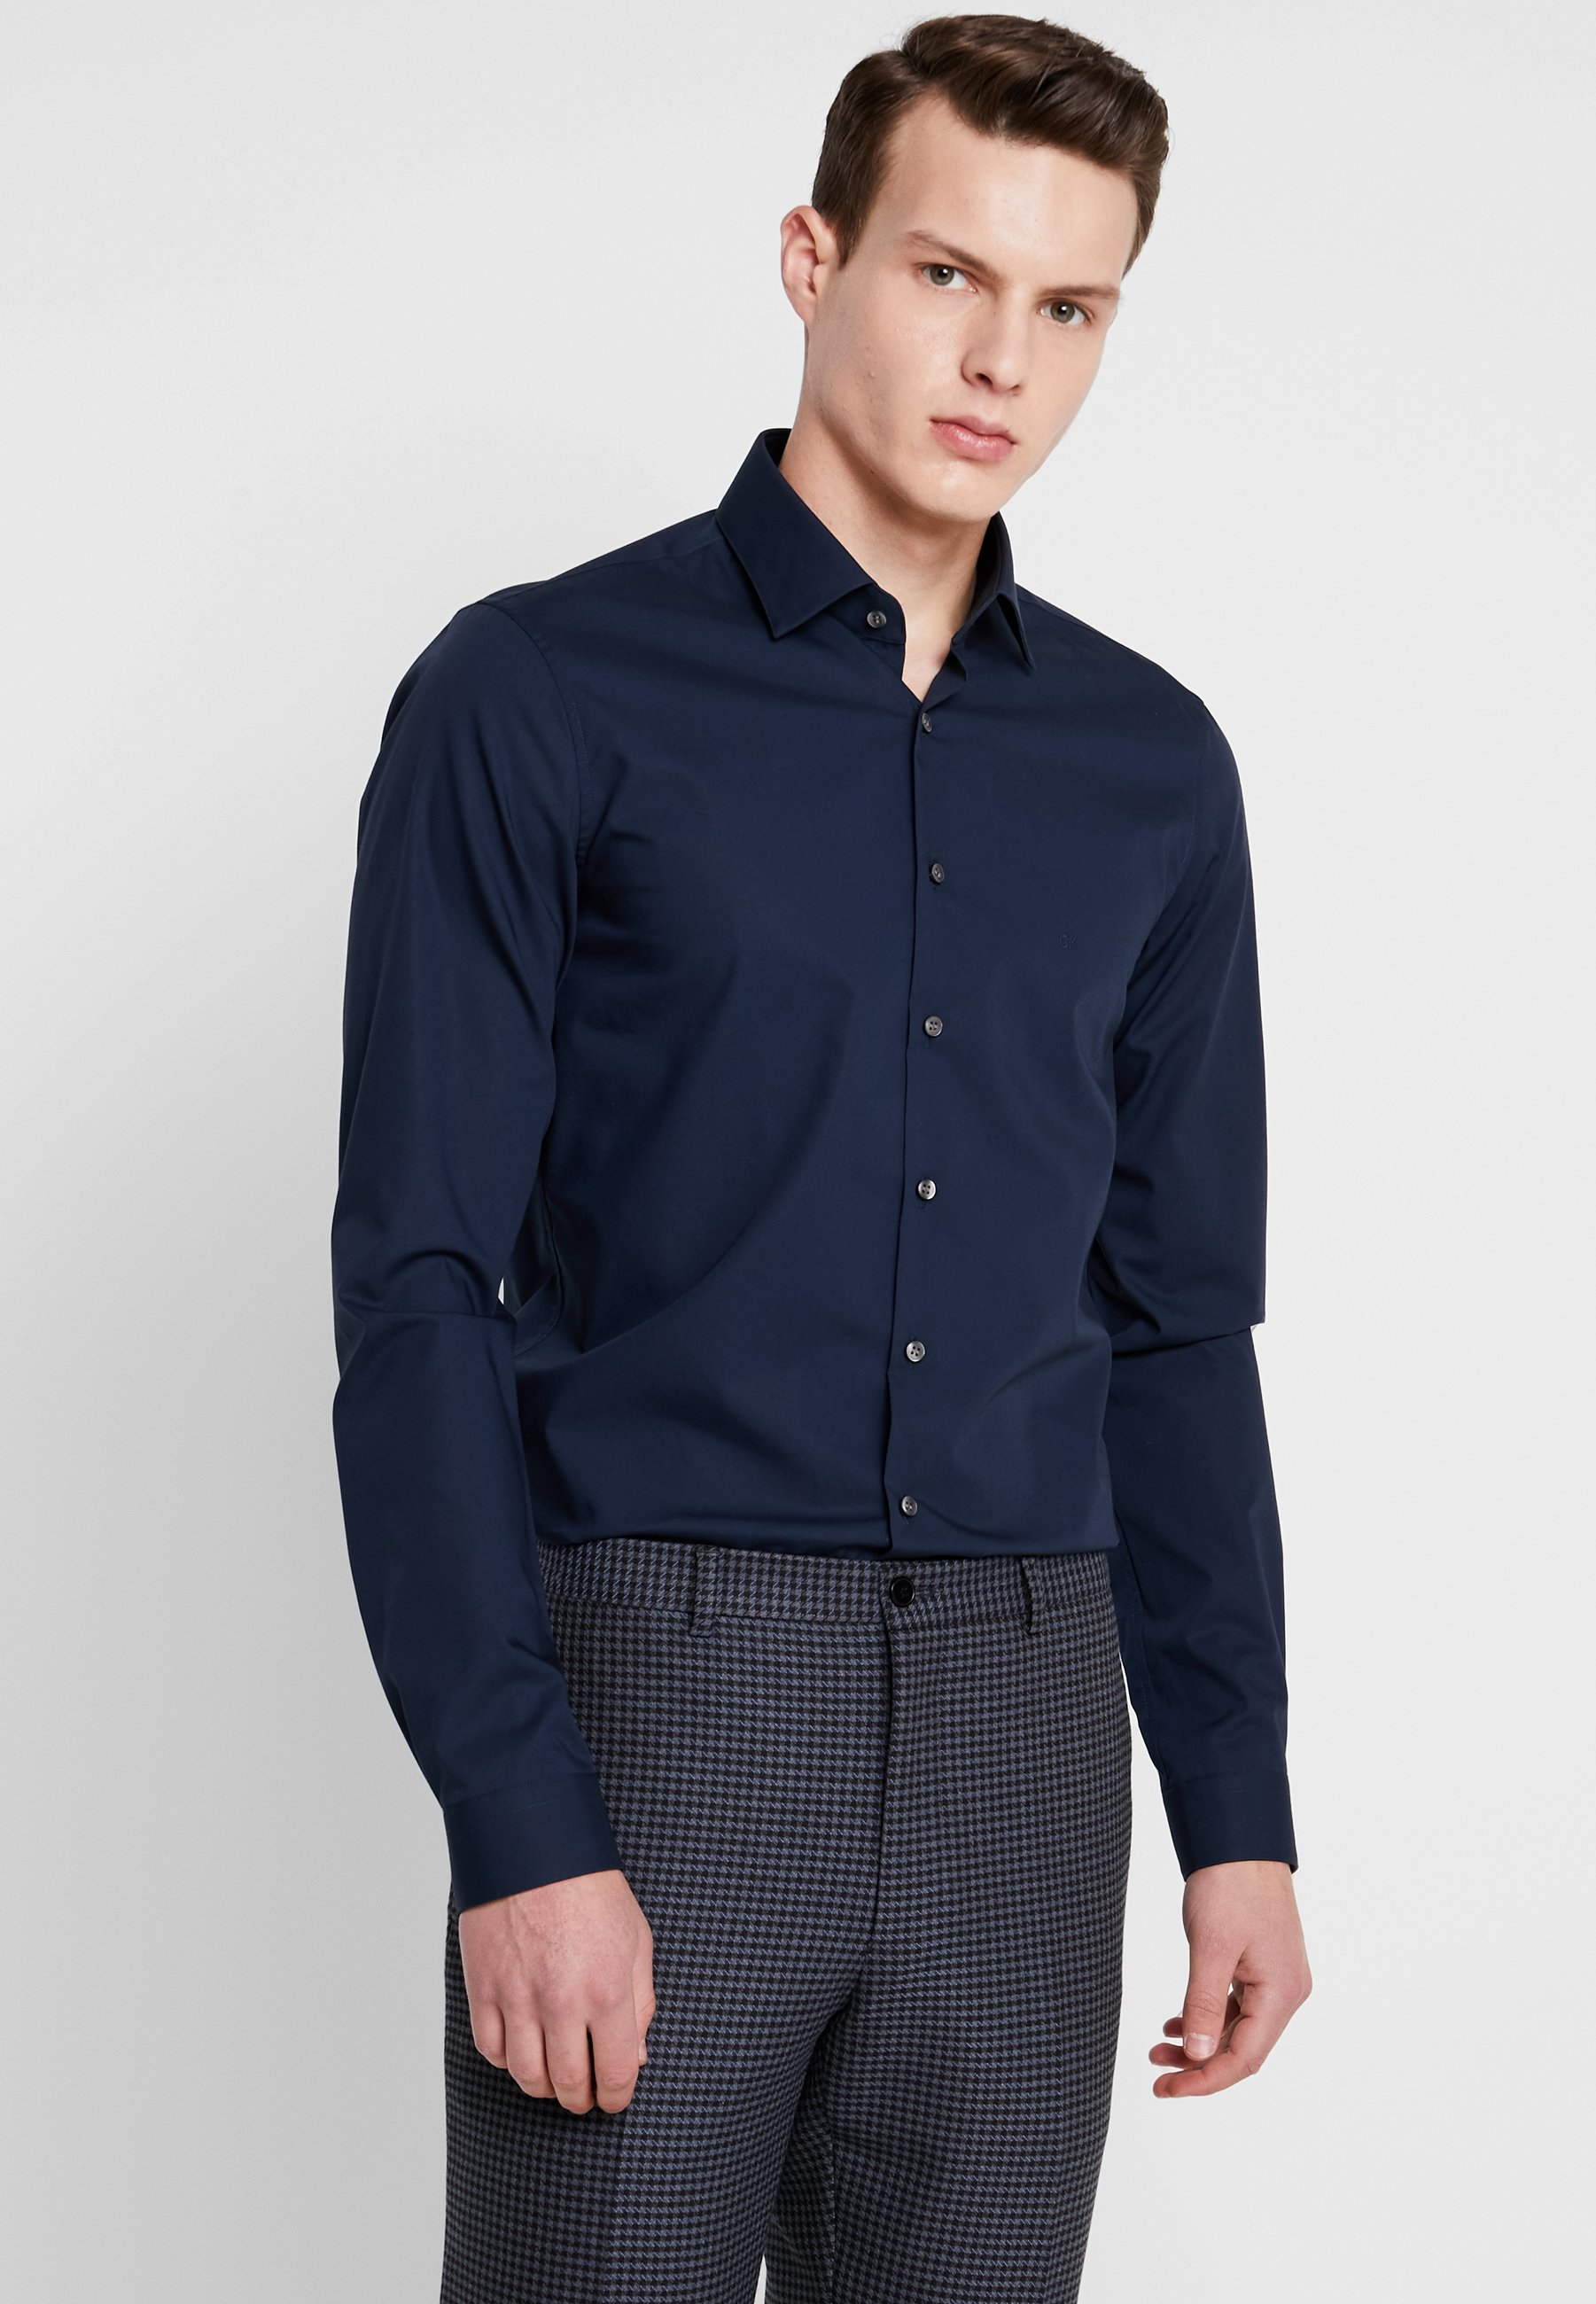 Poplin Blue Klein Extra Calvin Slim FitChemise Classique Tailored wNOXn0k8P